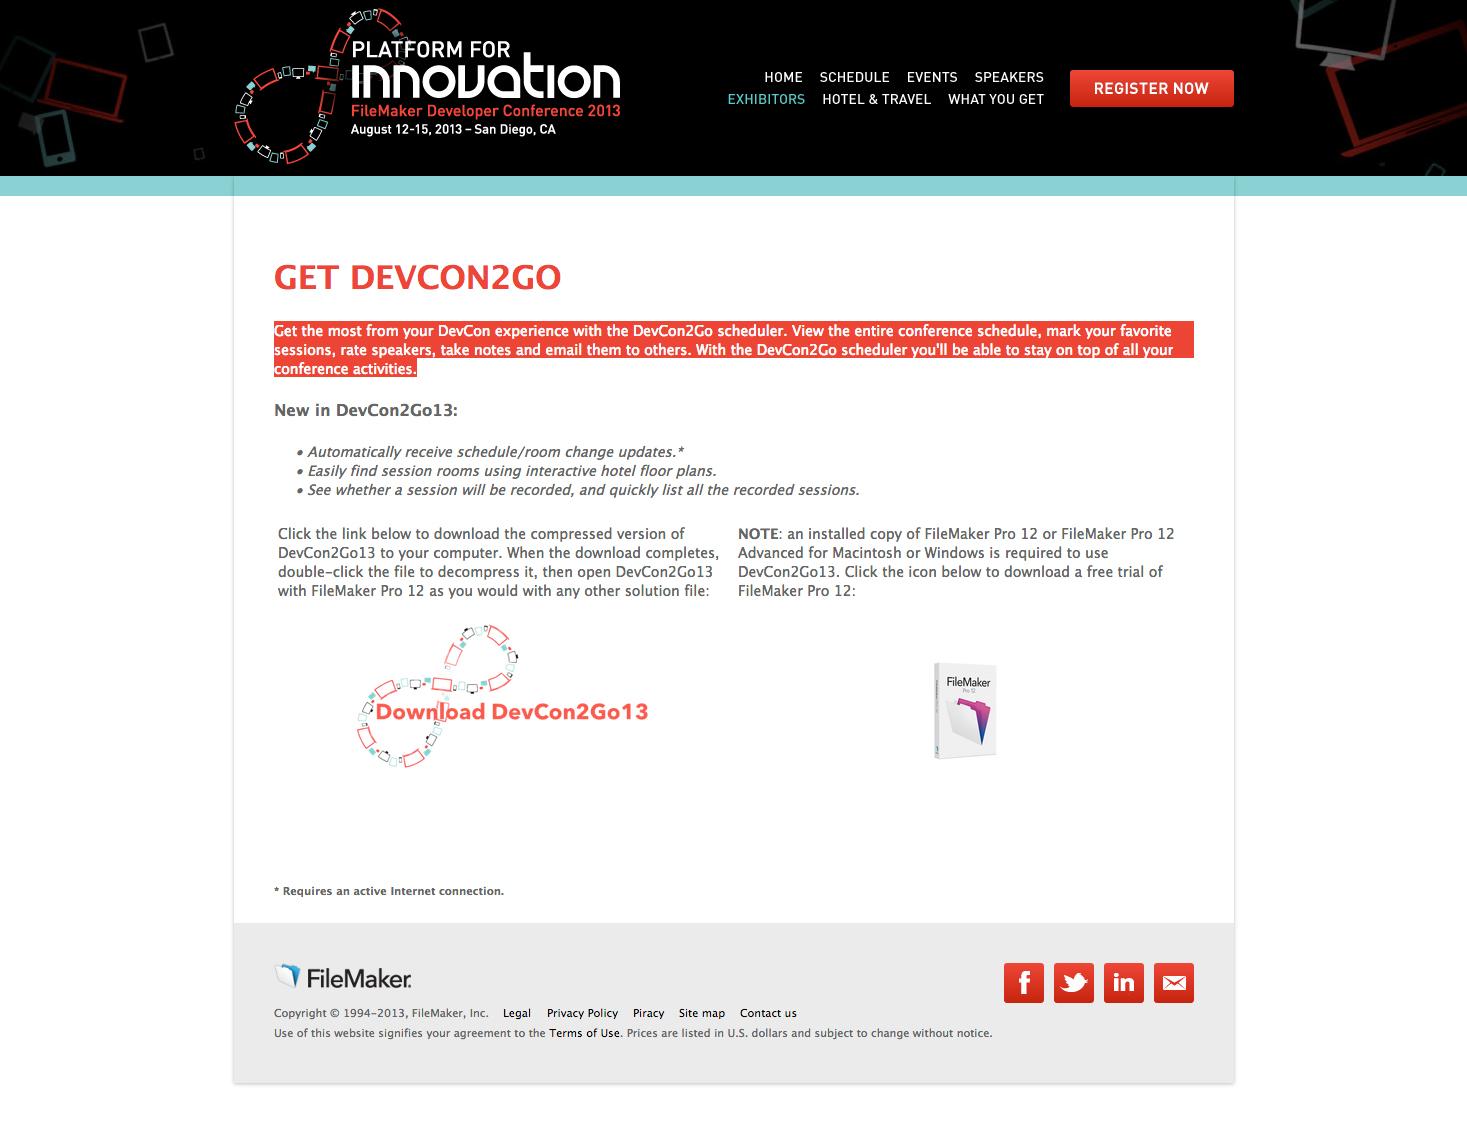 Filemaker free devcon2go scheduler 2013 by filemaker devcon friedricerecipe Image collections